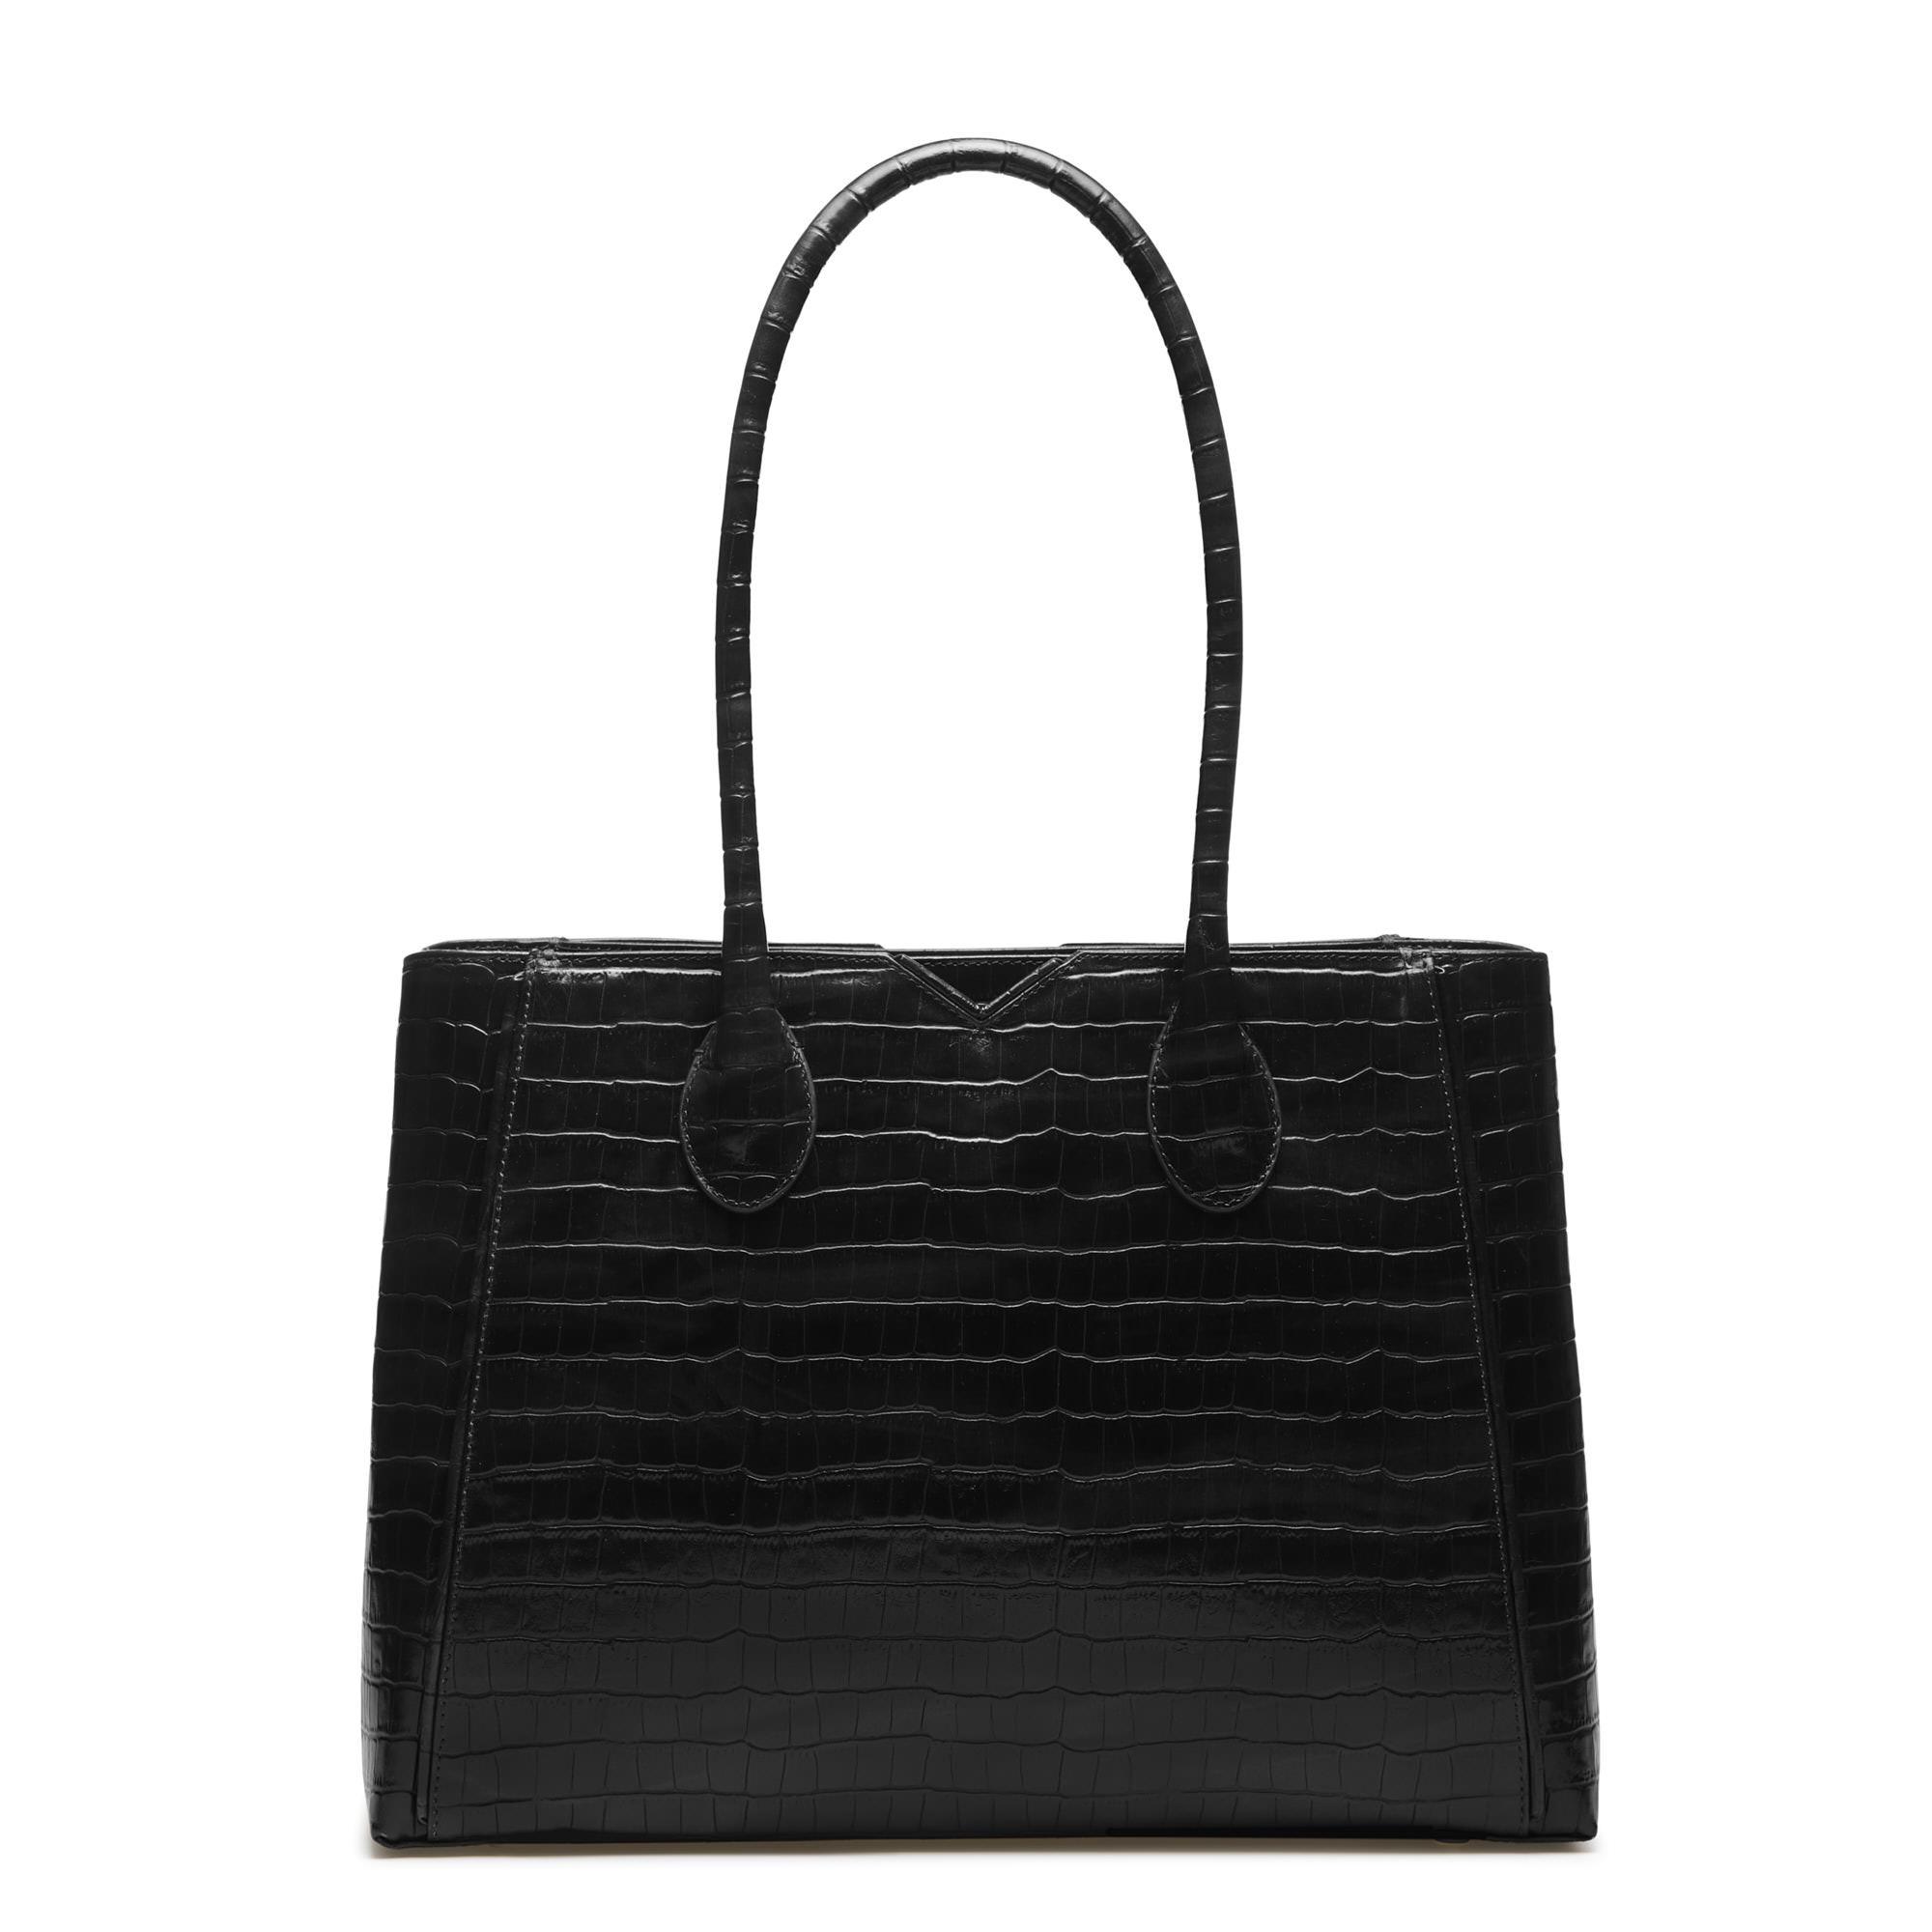 Isabel Bernard Honoré Cloe croco black calfskin leather handbag